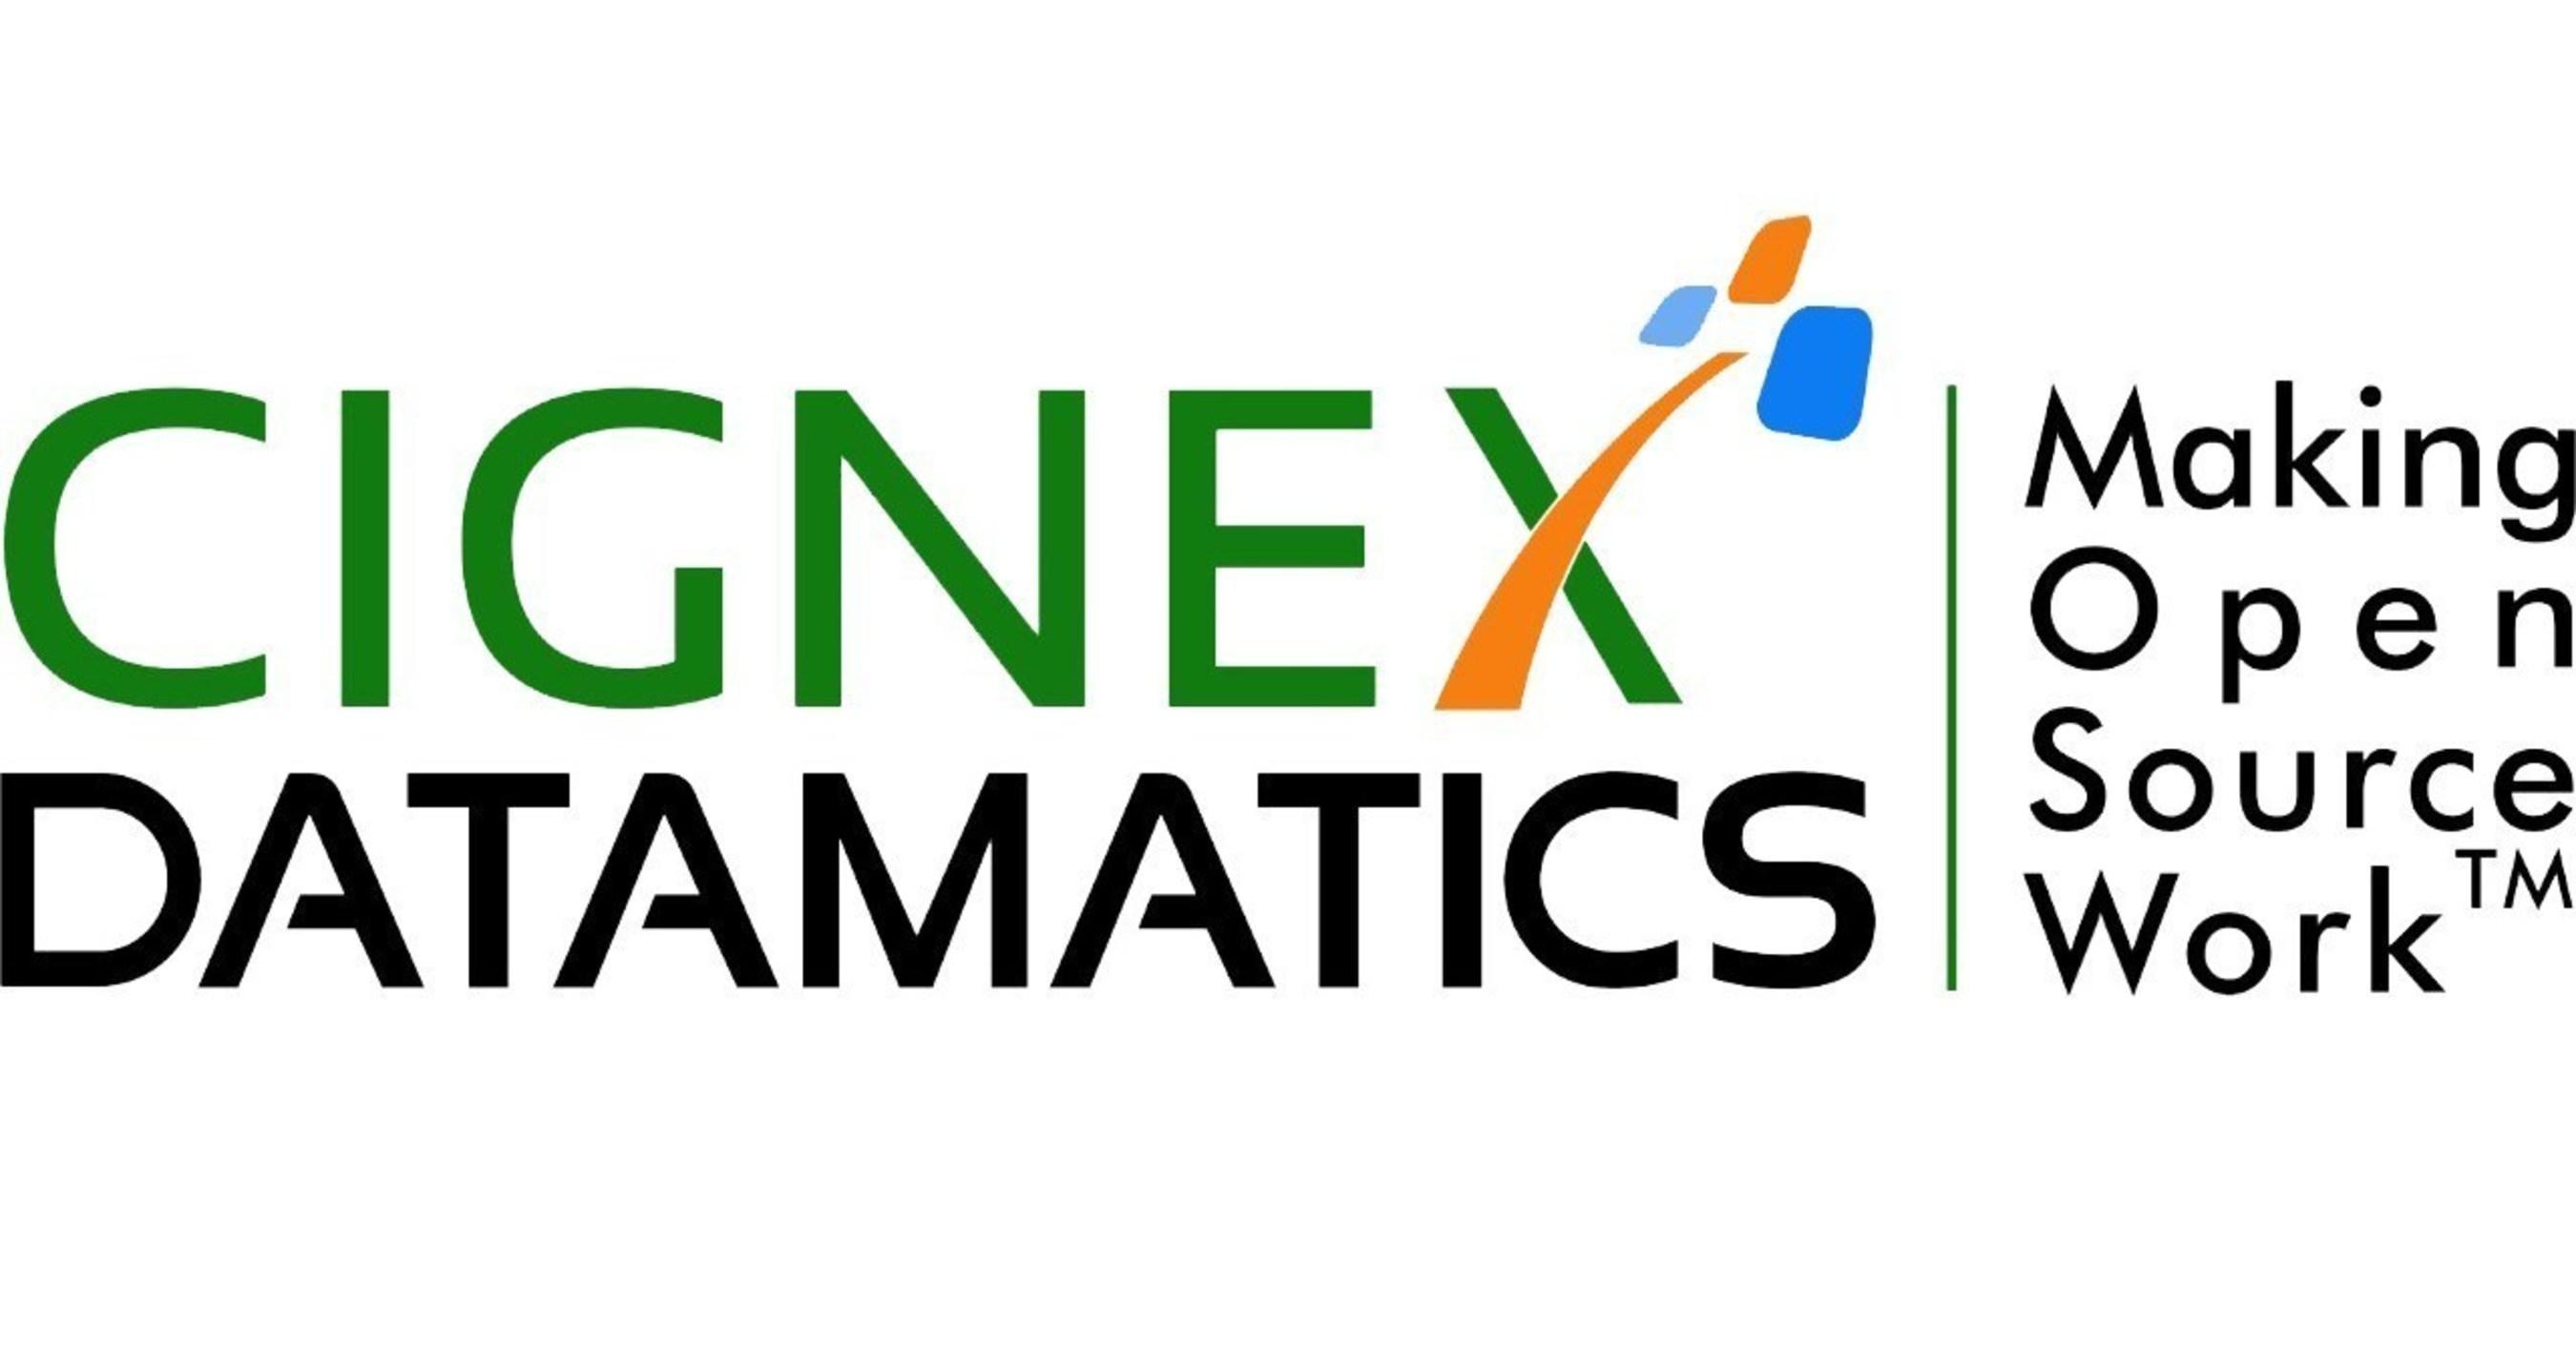 CIGNEX Datamatics Presents Webinar on Simplifying E-commerce Content Management & Publishing